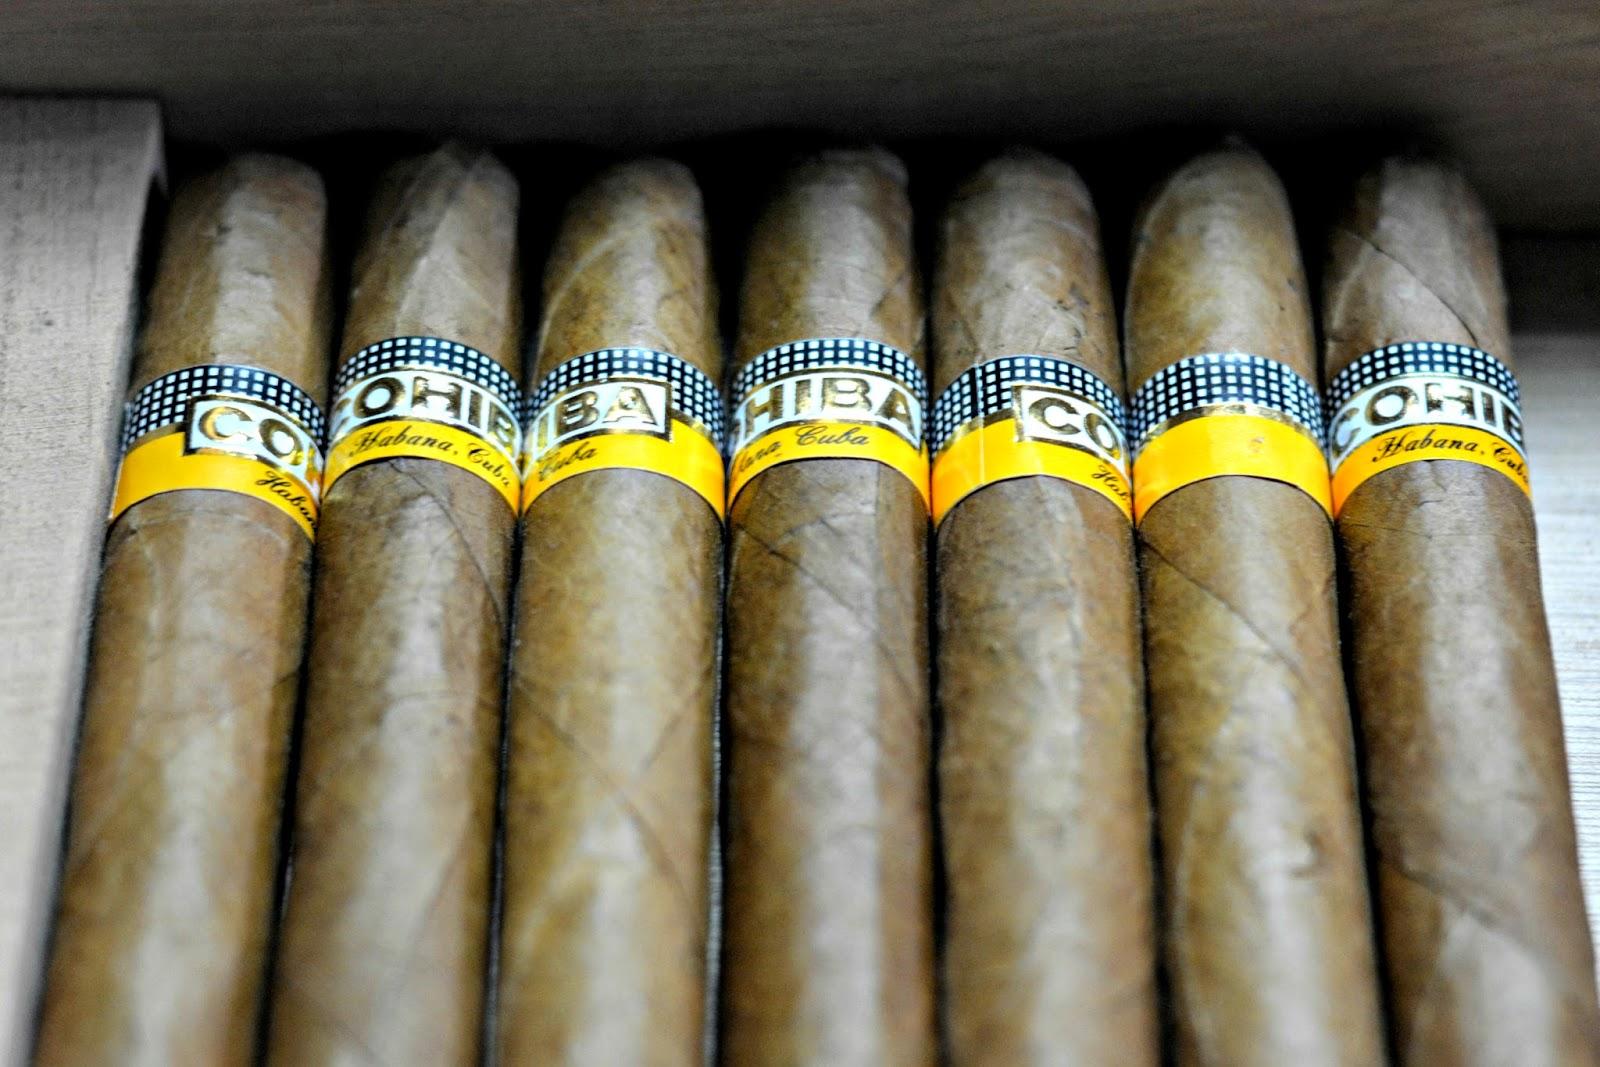 Cohiba Cigars in Havana Cuba